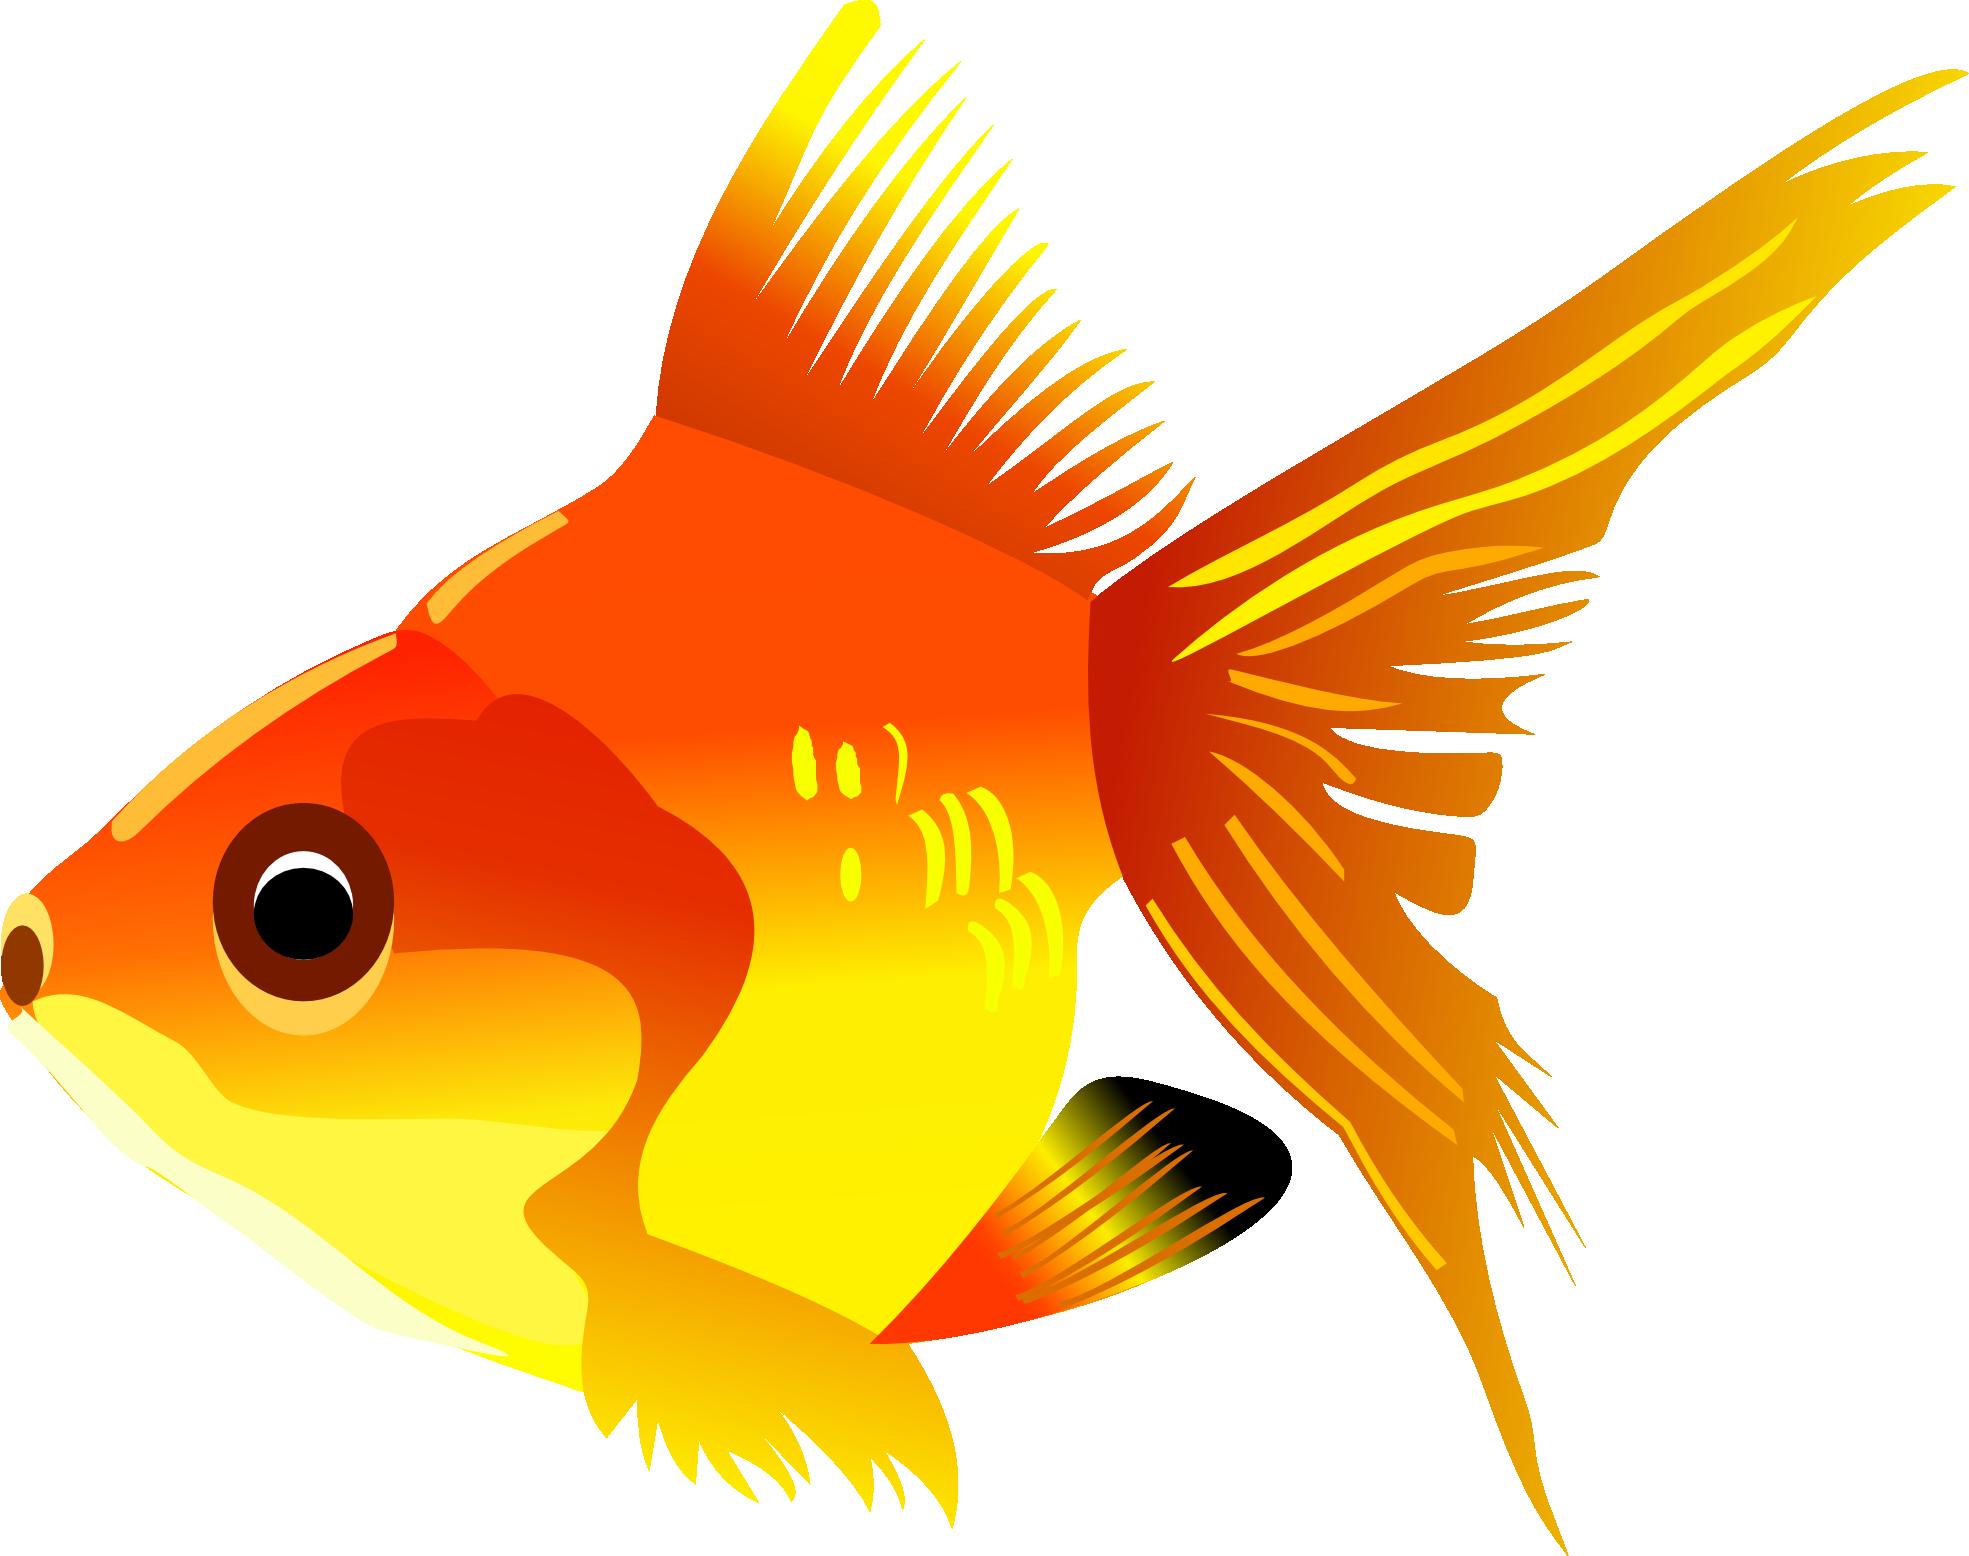 gold fish PNG image